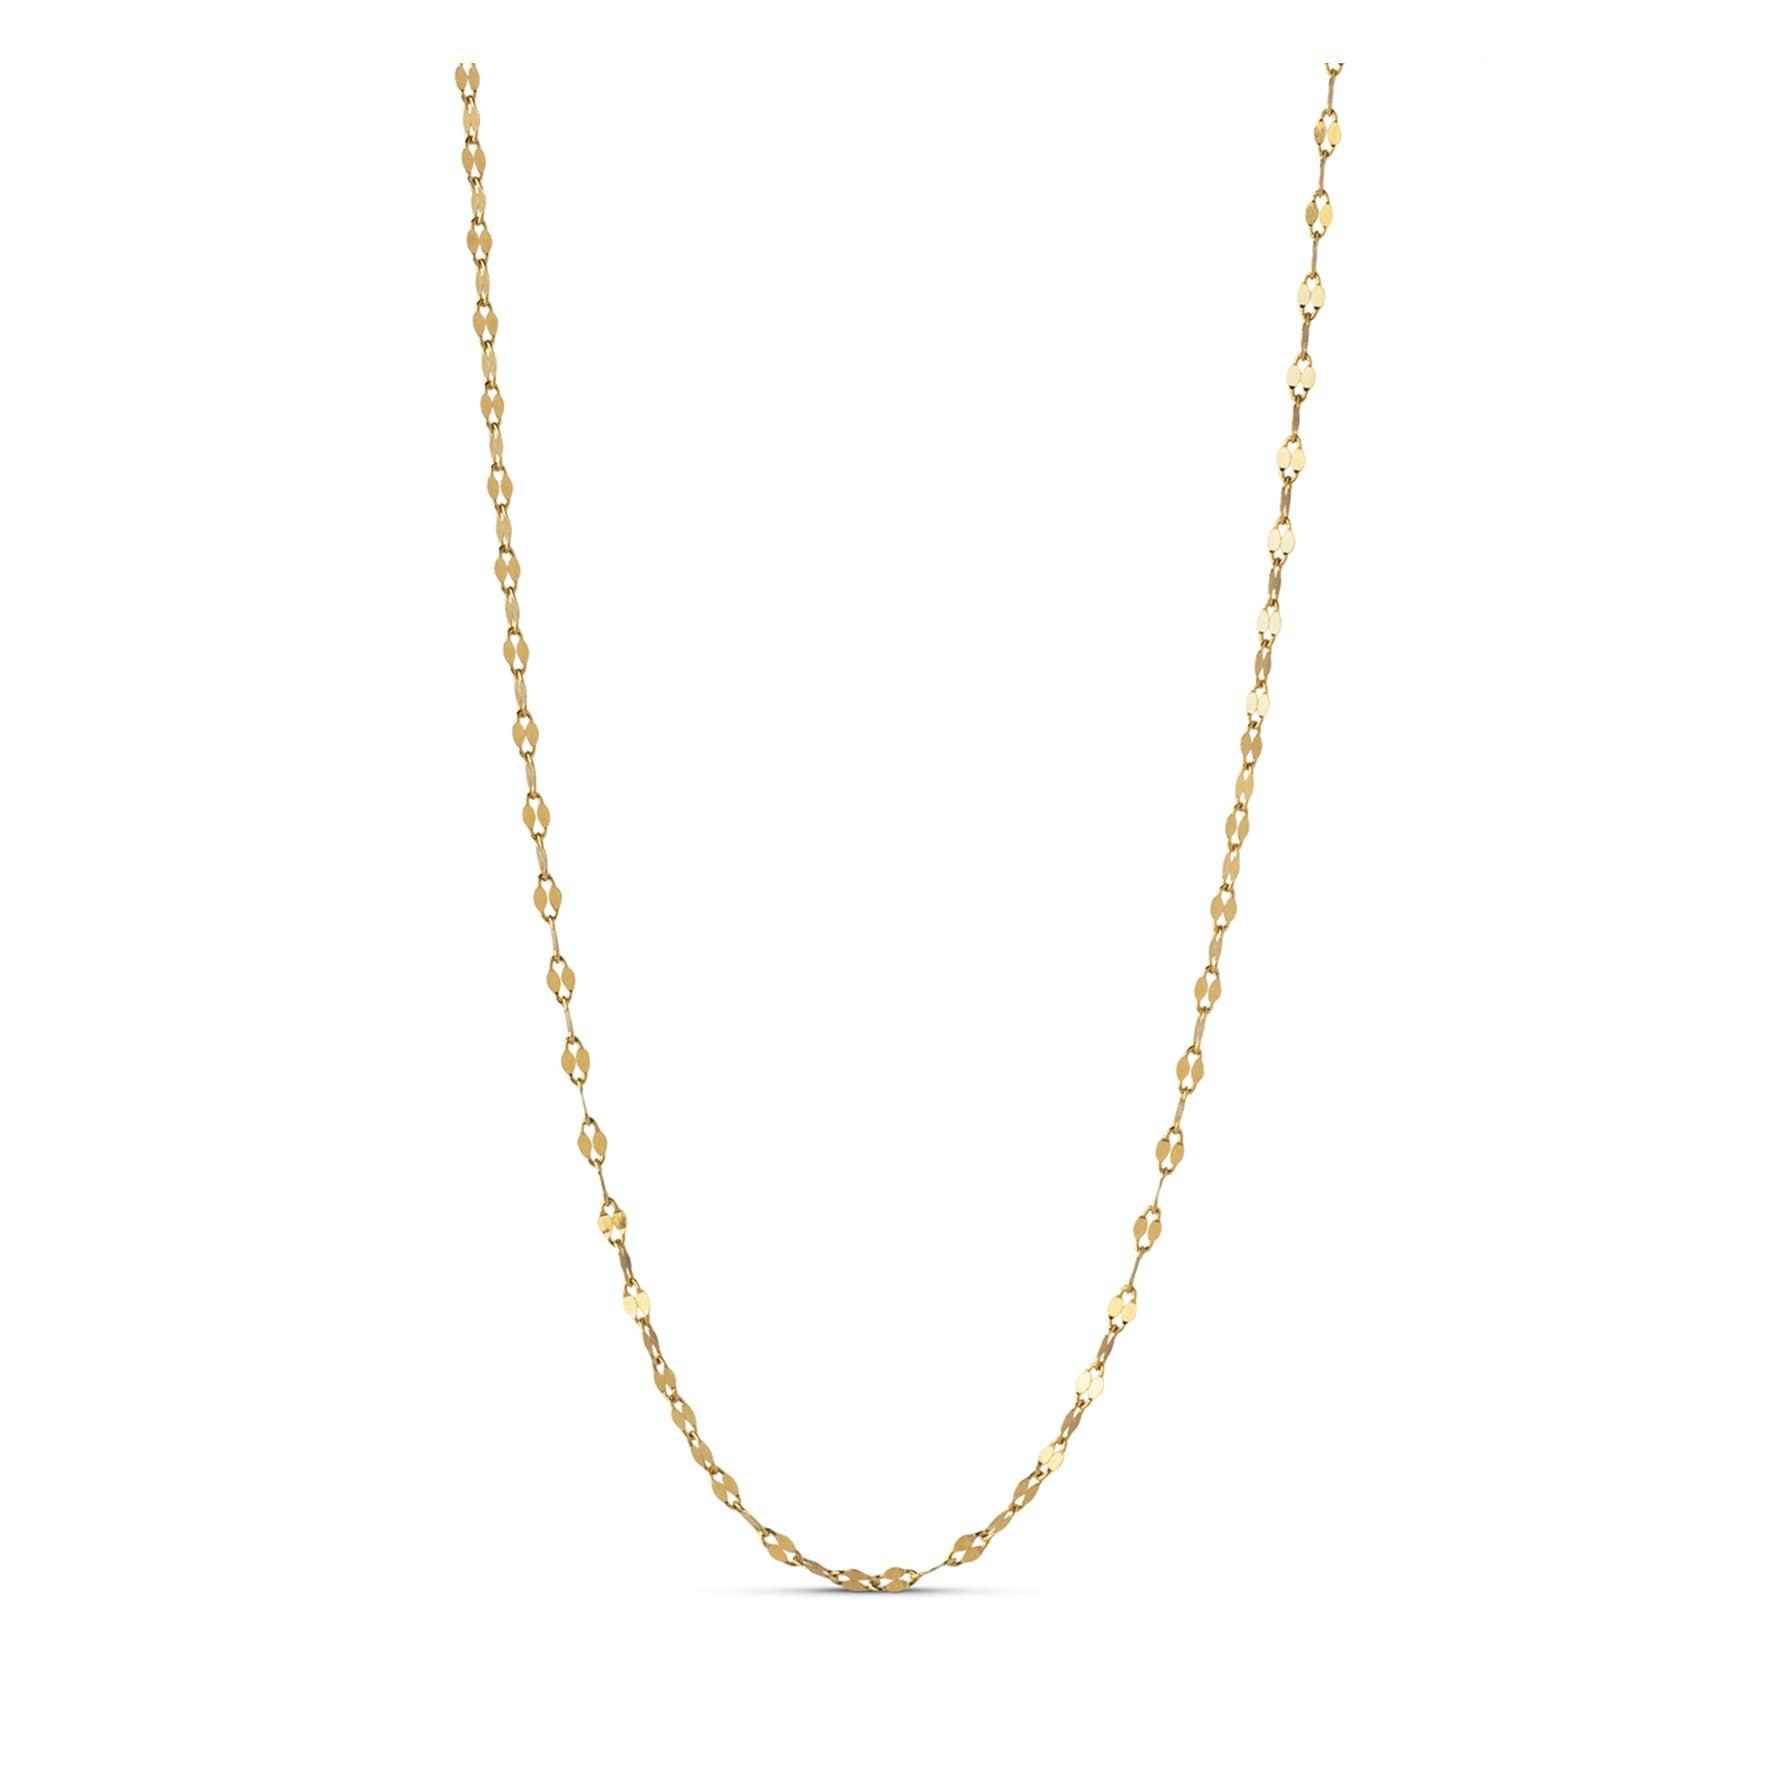 Ona Necklace von Enamel Copenhagen in Vergoldet-Silber Sterling 925